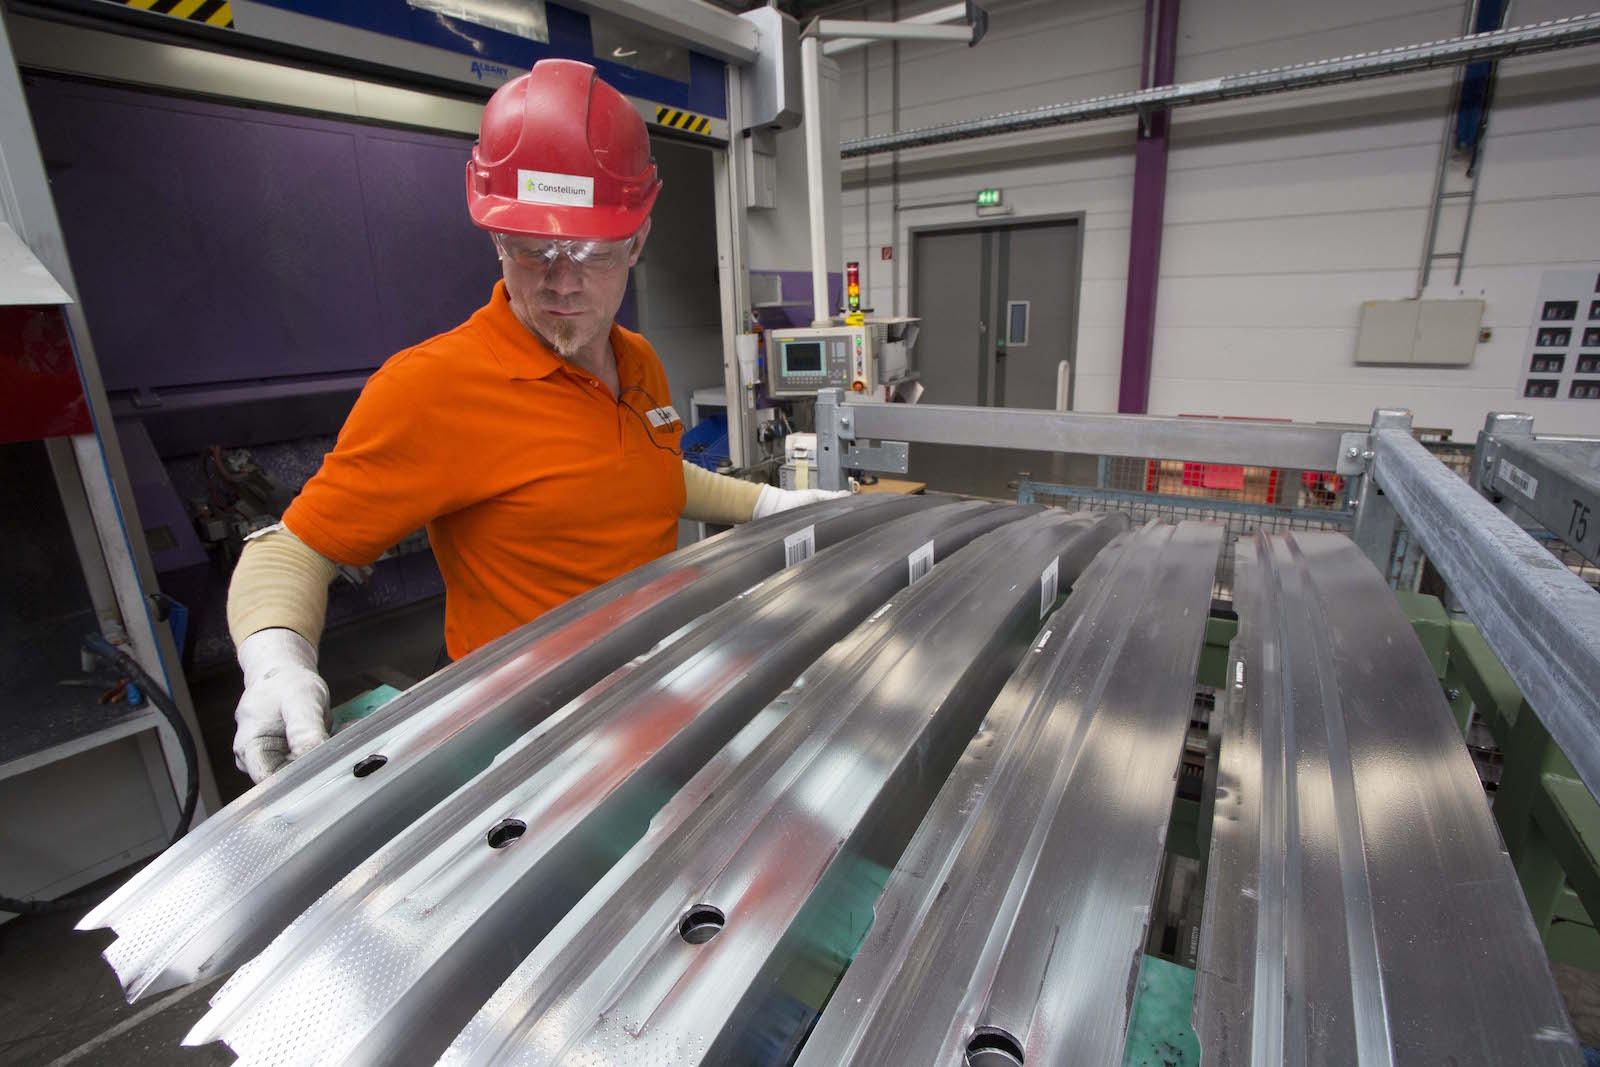 Manufacturing of aluminum crash management systems